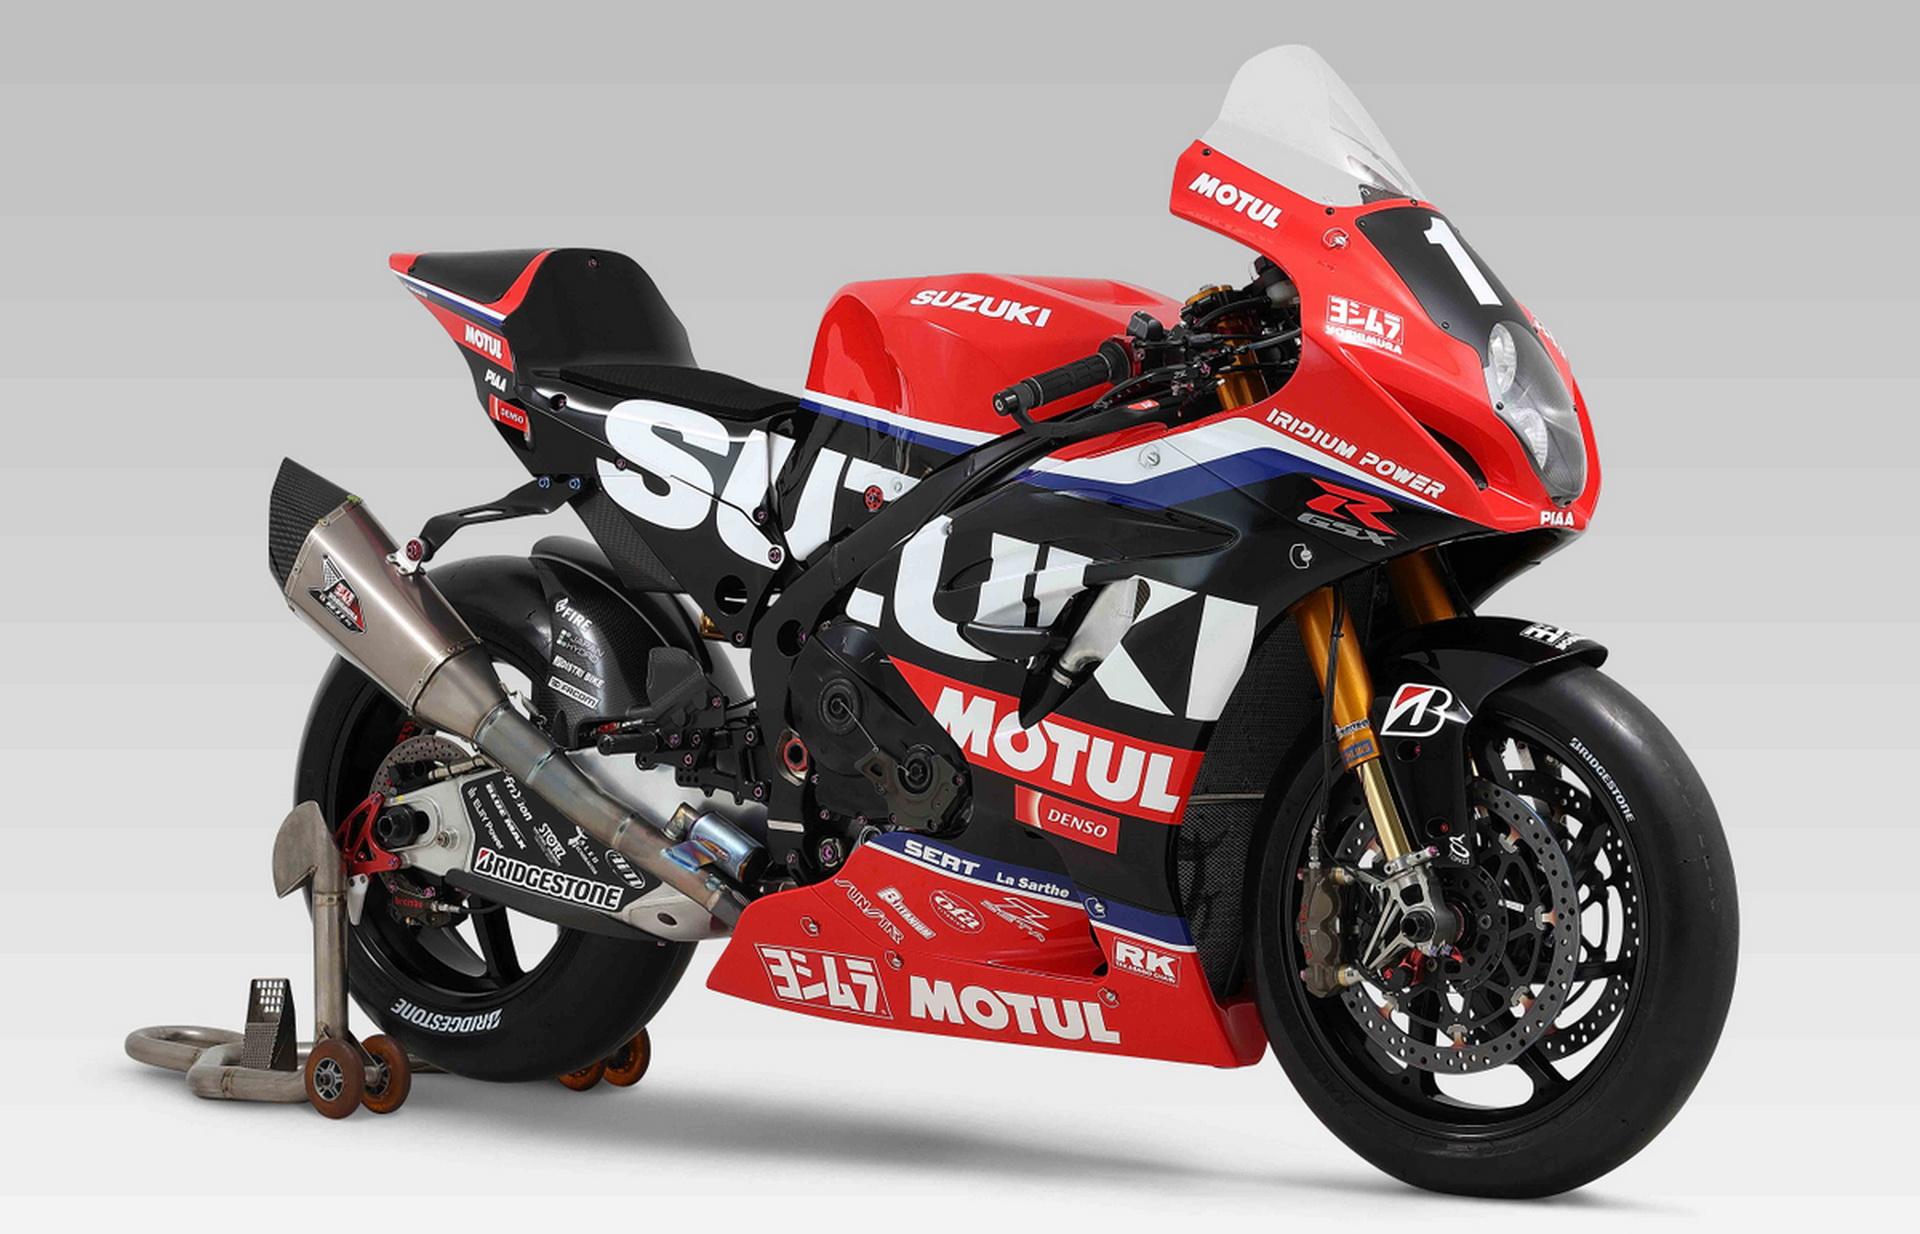 Yoshimura y Suzuki Endurance se unen para formar Yoshimura SERT Motul Team